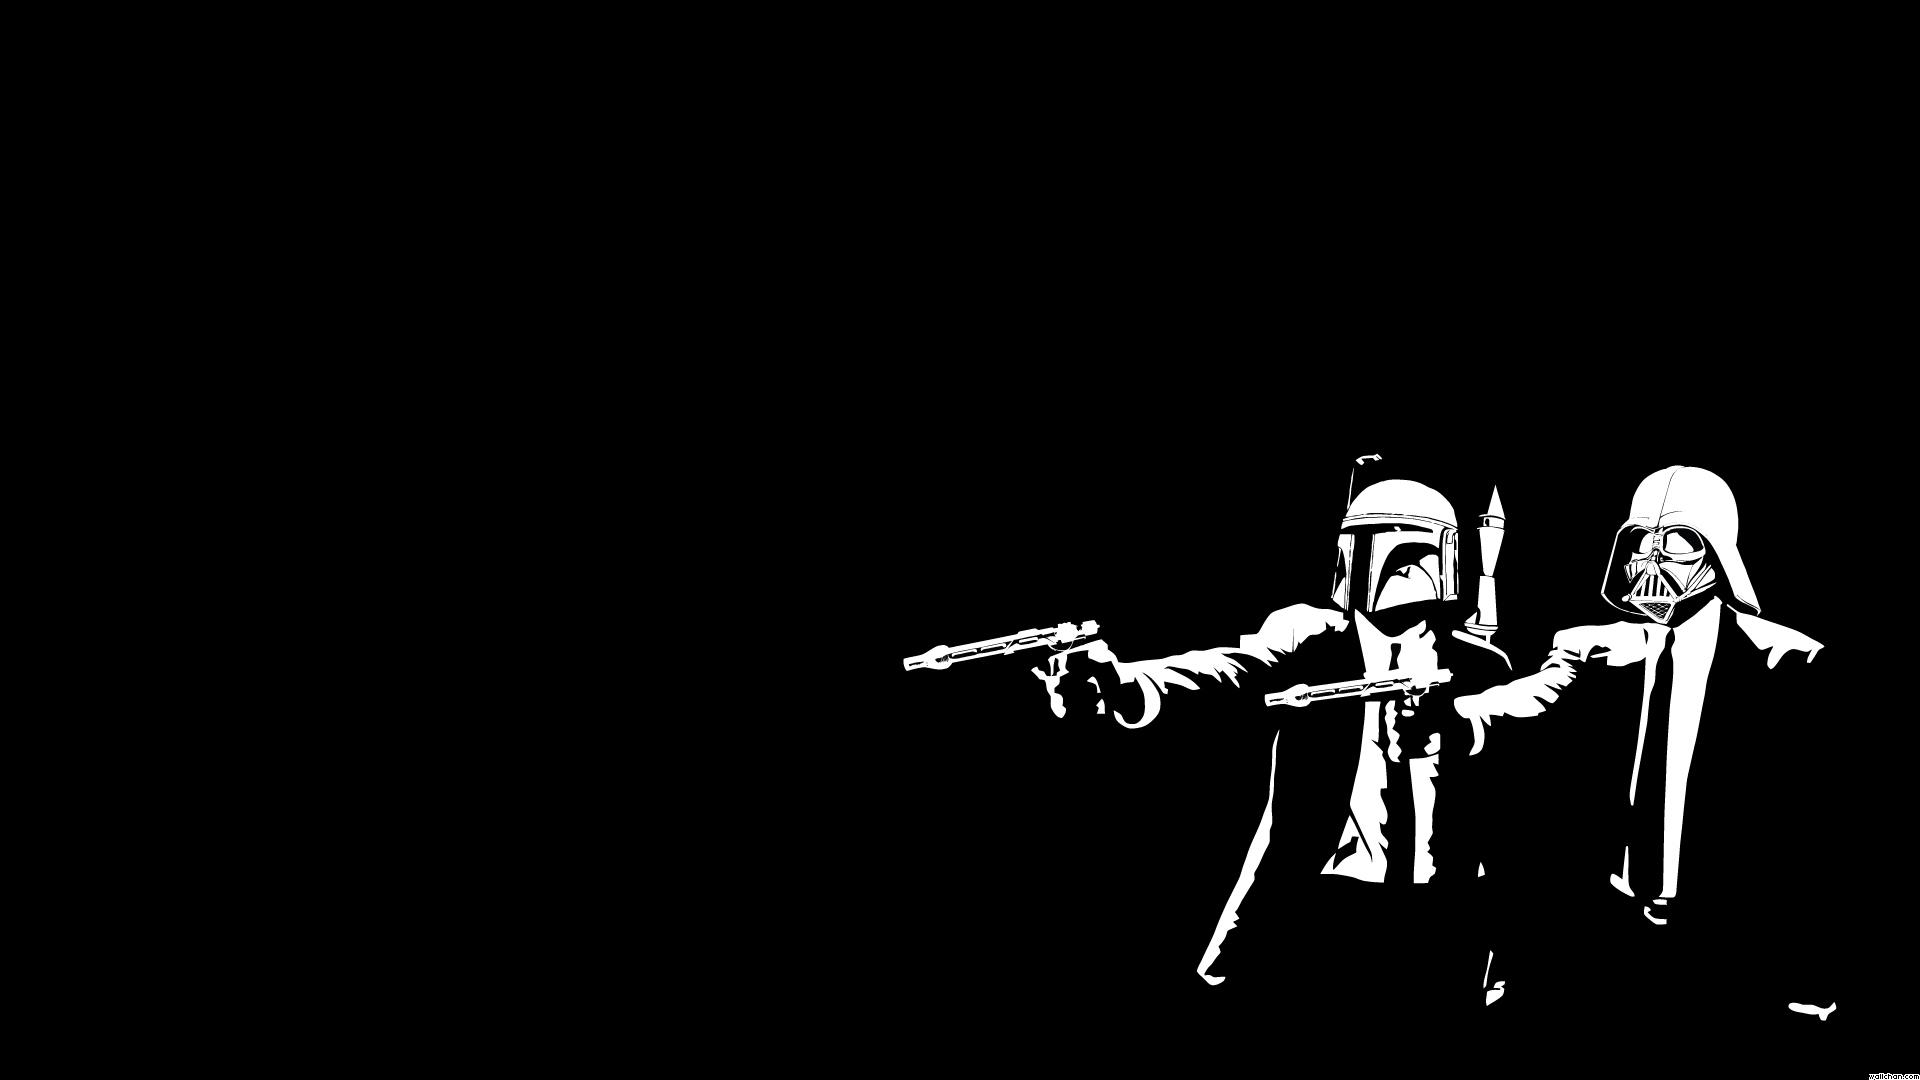 10 Top Star Wars Pulp Fiction Wallpaper Full Hd 1080p For Pc Desktop